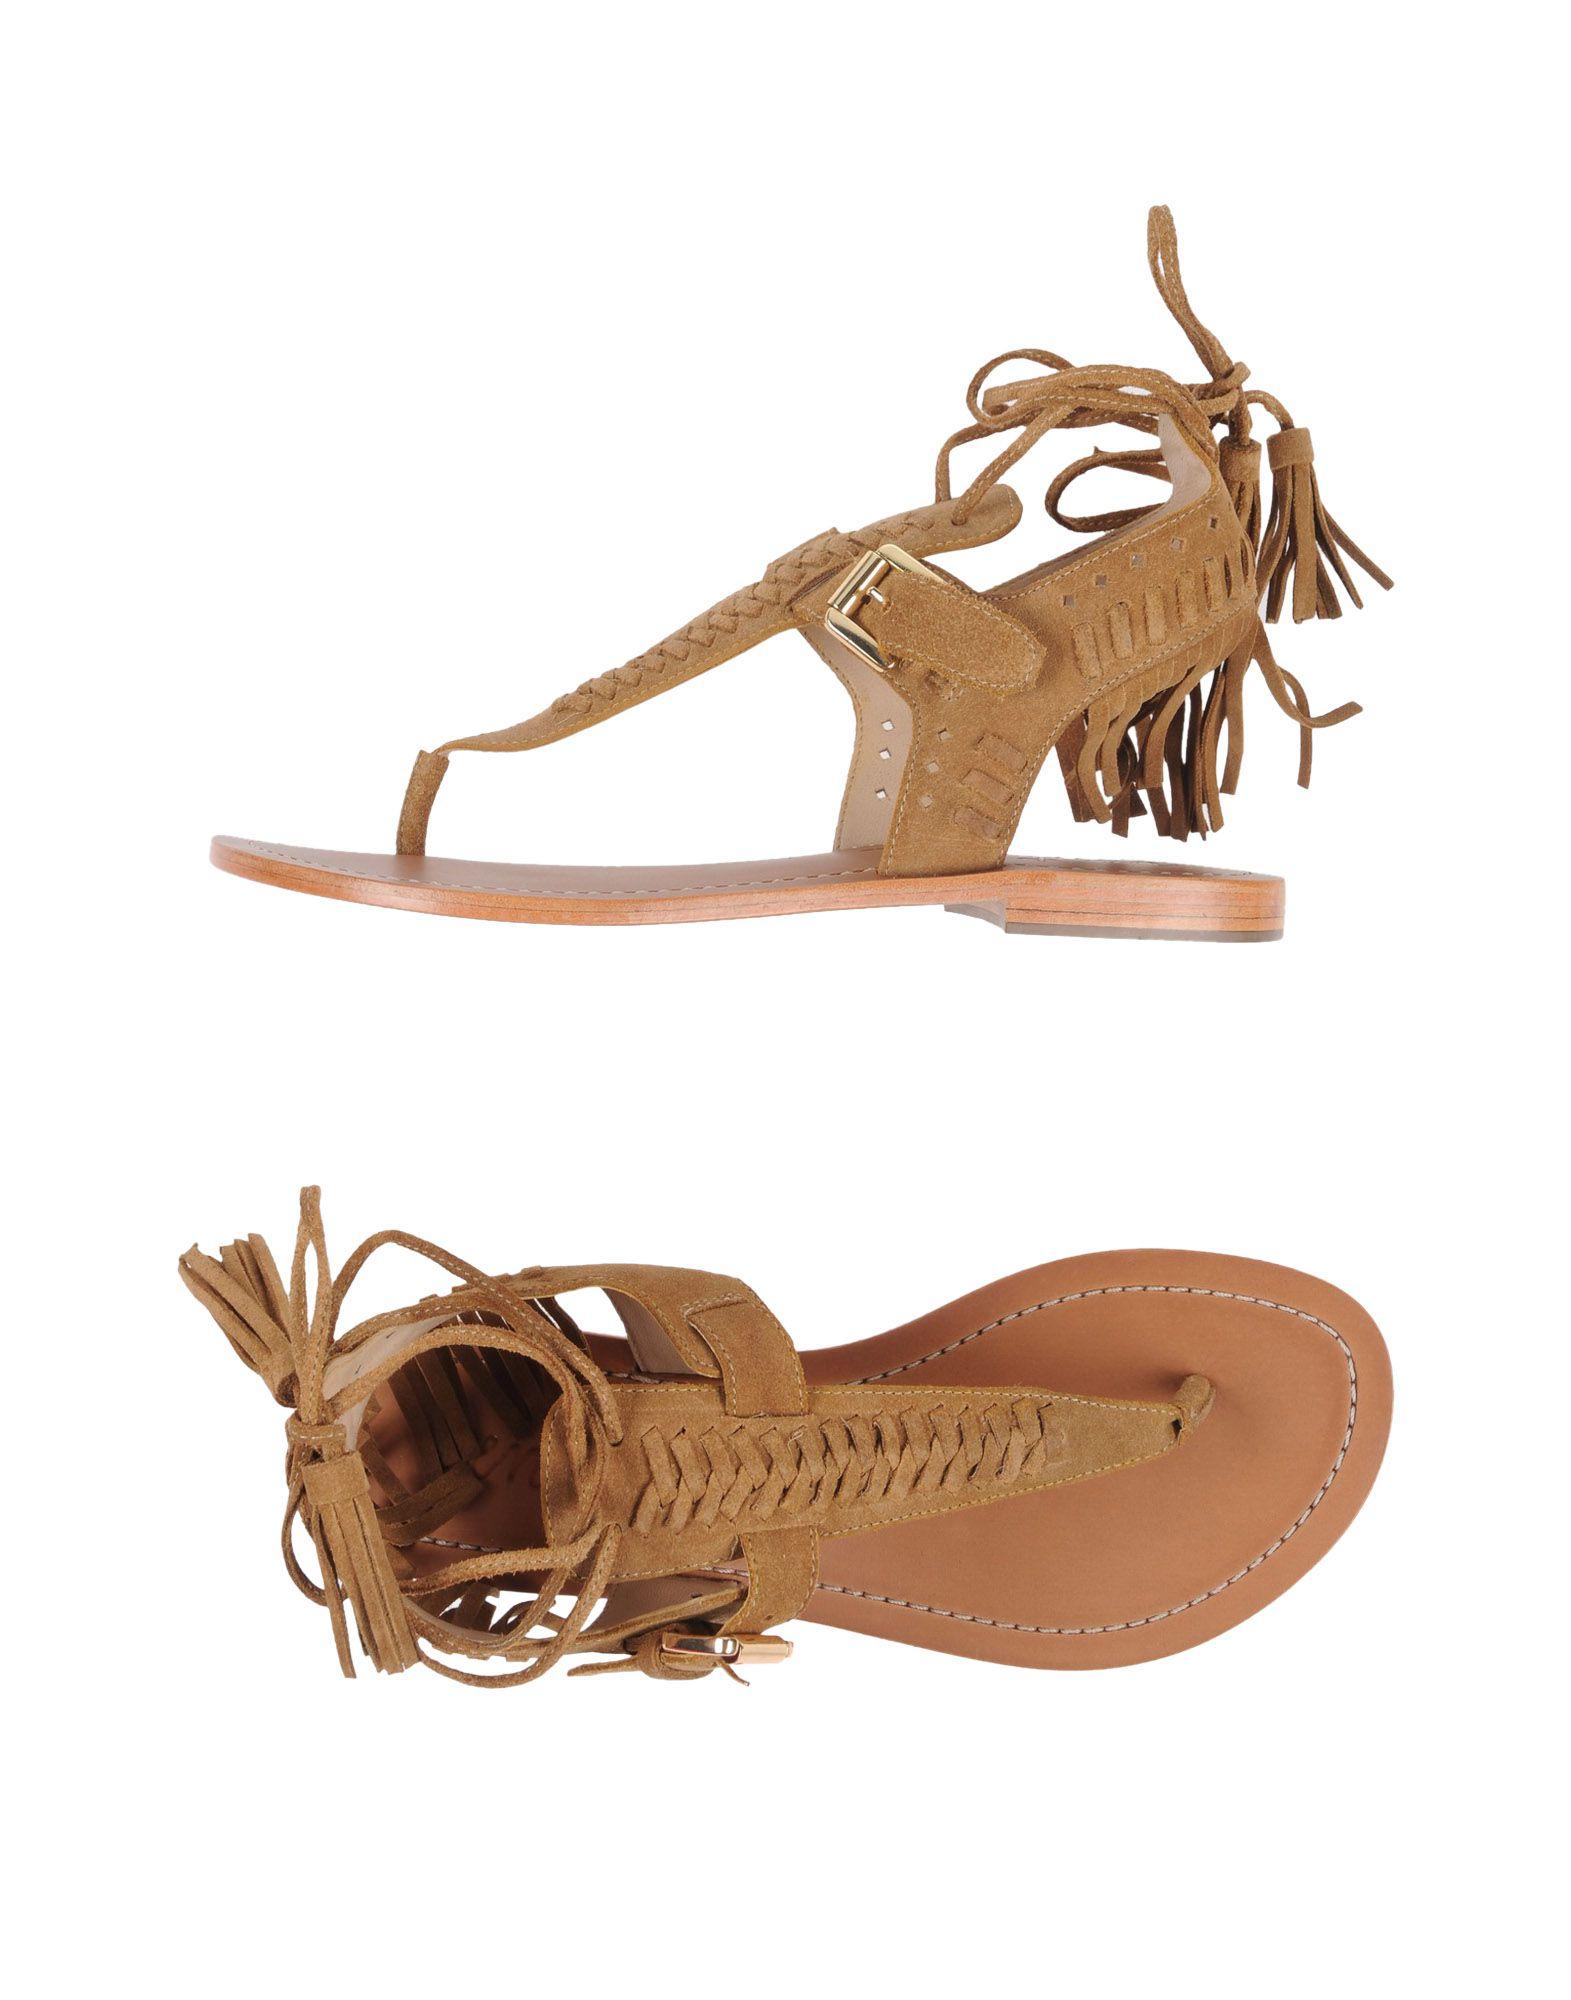 VENTI 12 Flip Flops in Camel